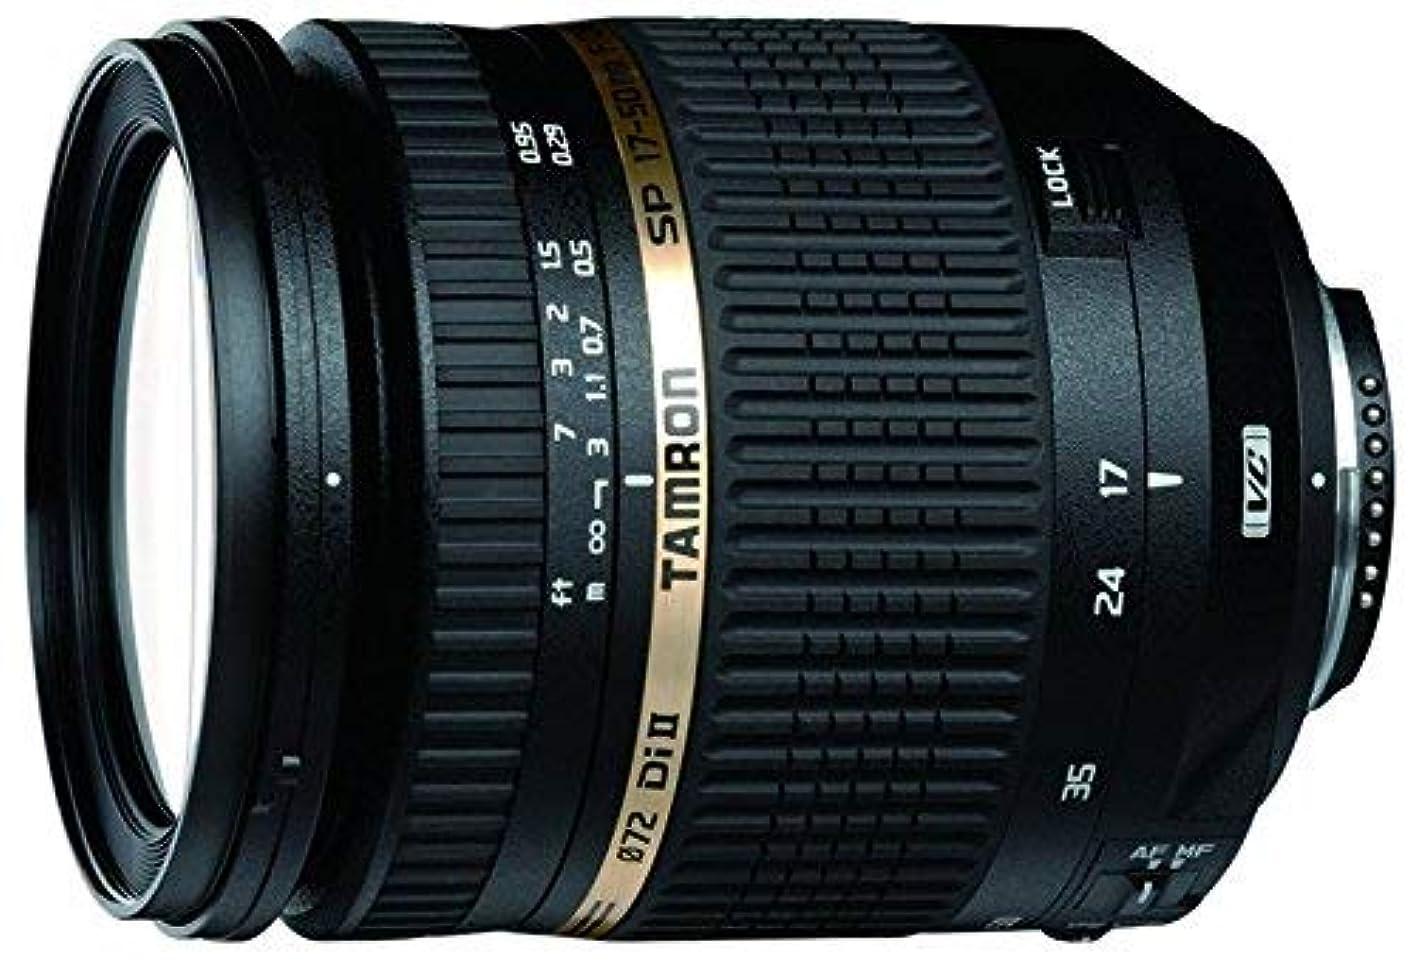 Tamron AF 17-50MM F/2.8 SP XR Di II VC Zoom Lens for Nikon - International Version (No Warranty) zejvioqkyxe070